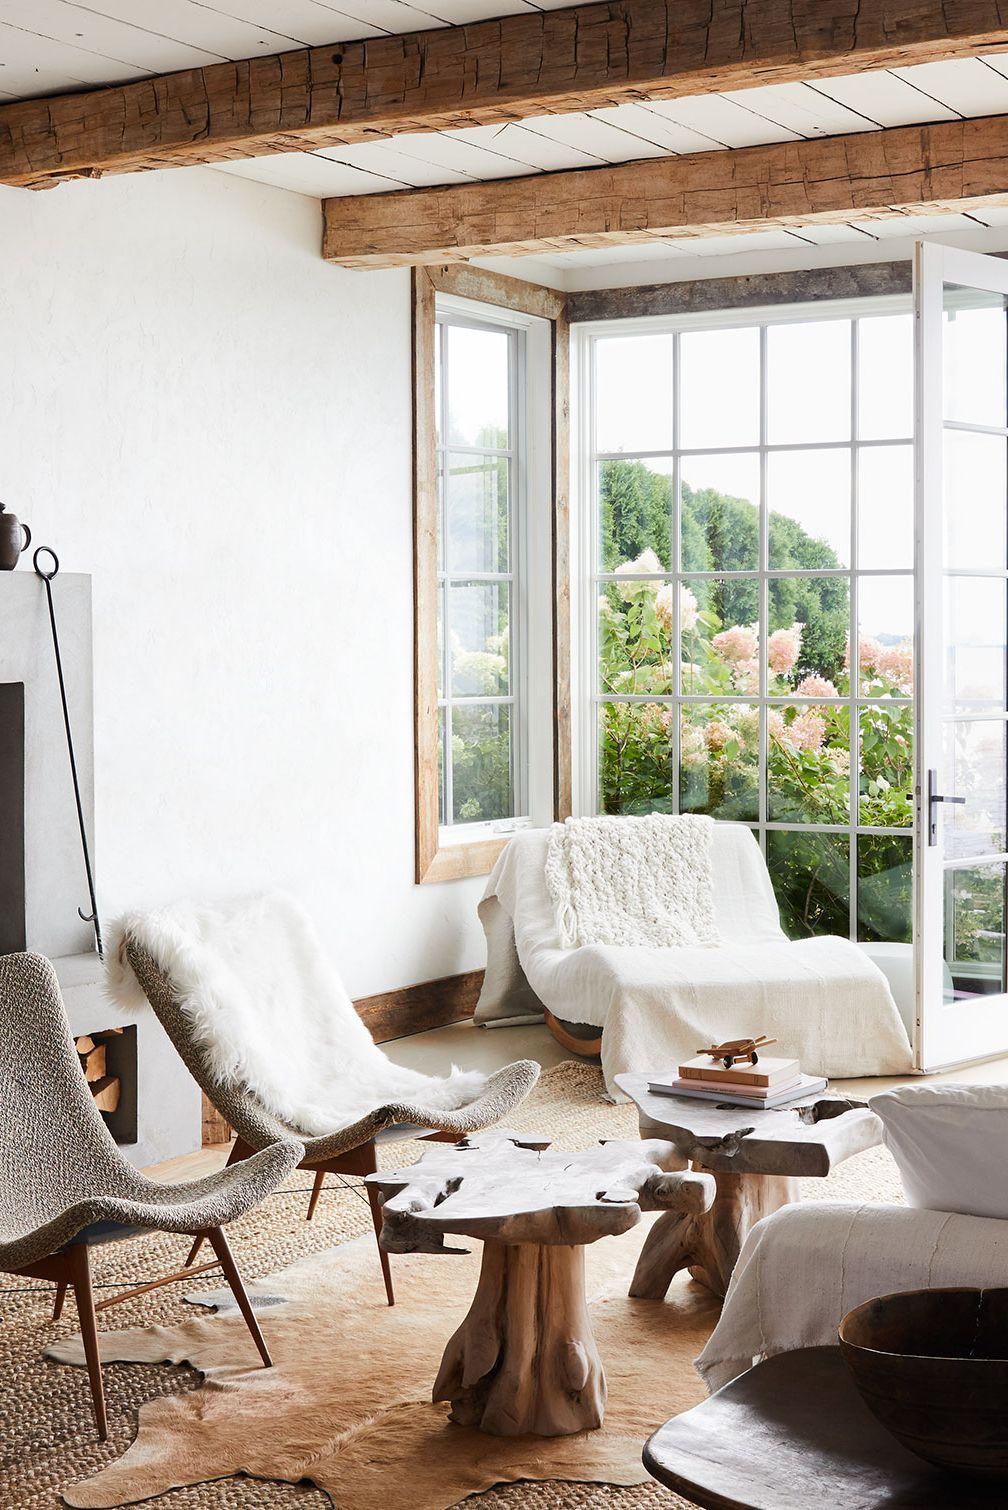 Neutral furniture Country Farmhouse Neutral Family Room Boca Do Lobo 31 Stylish Family Room Design Ideas Easy Decorating Tips For